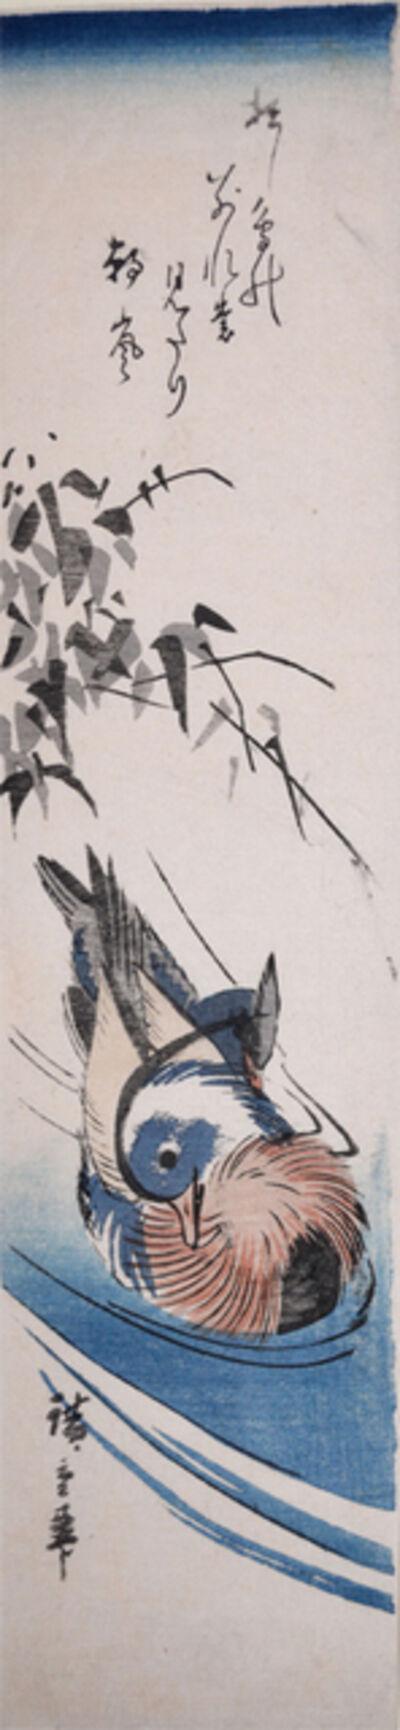 Utagawa Hiroshige (Andō Hiroshige), 'Mandarin Ducks', ca. 1840